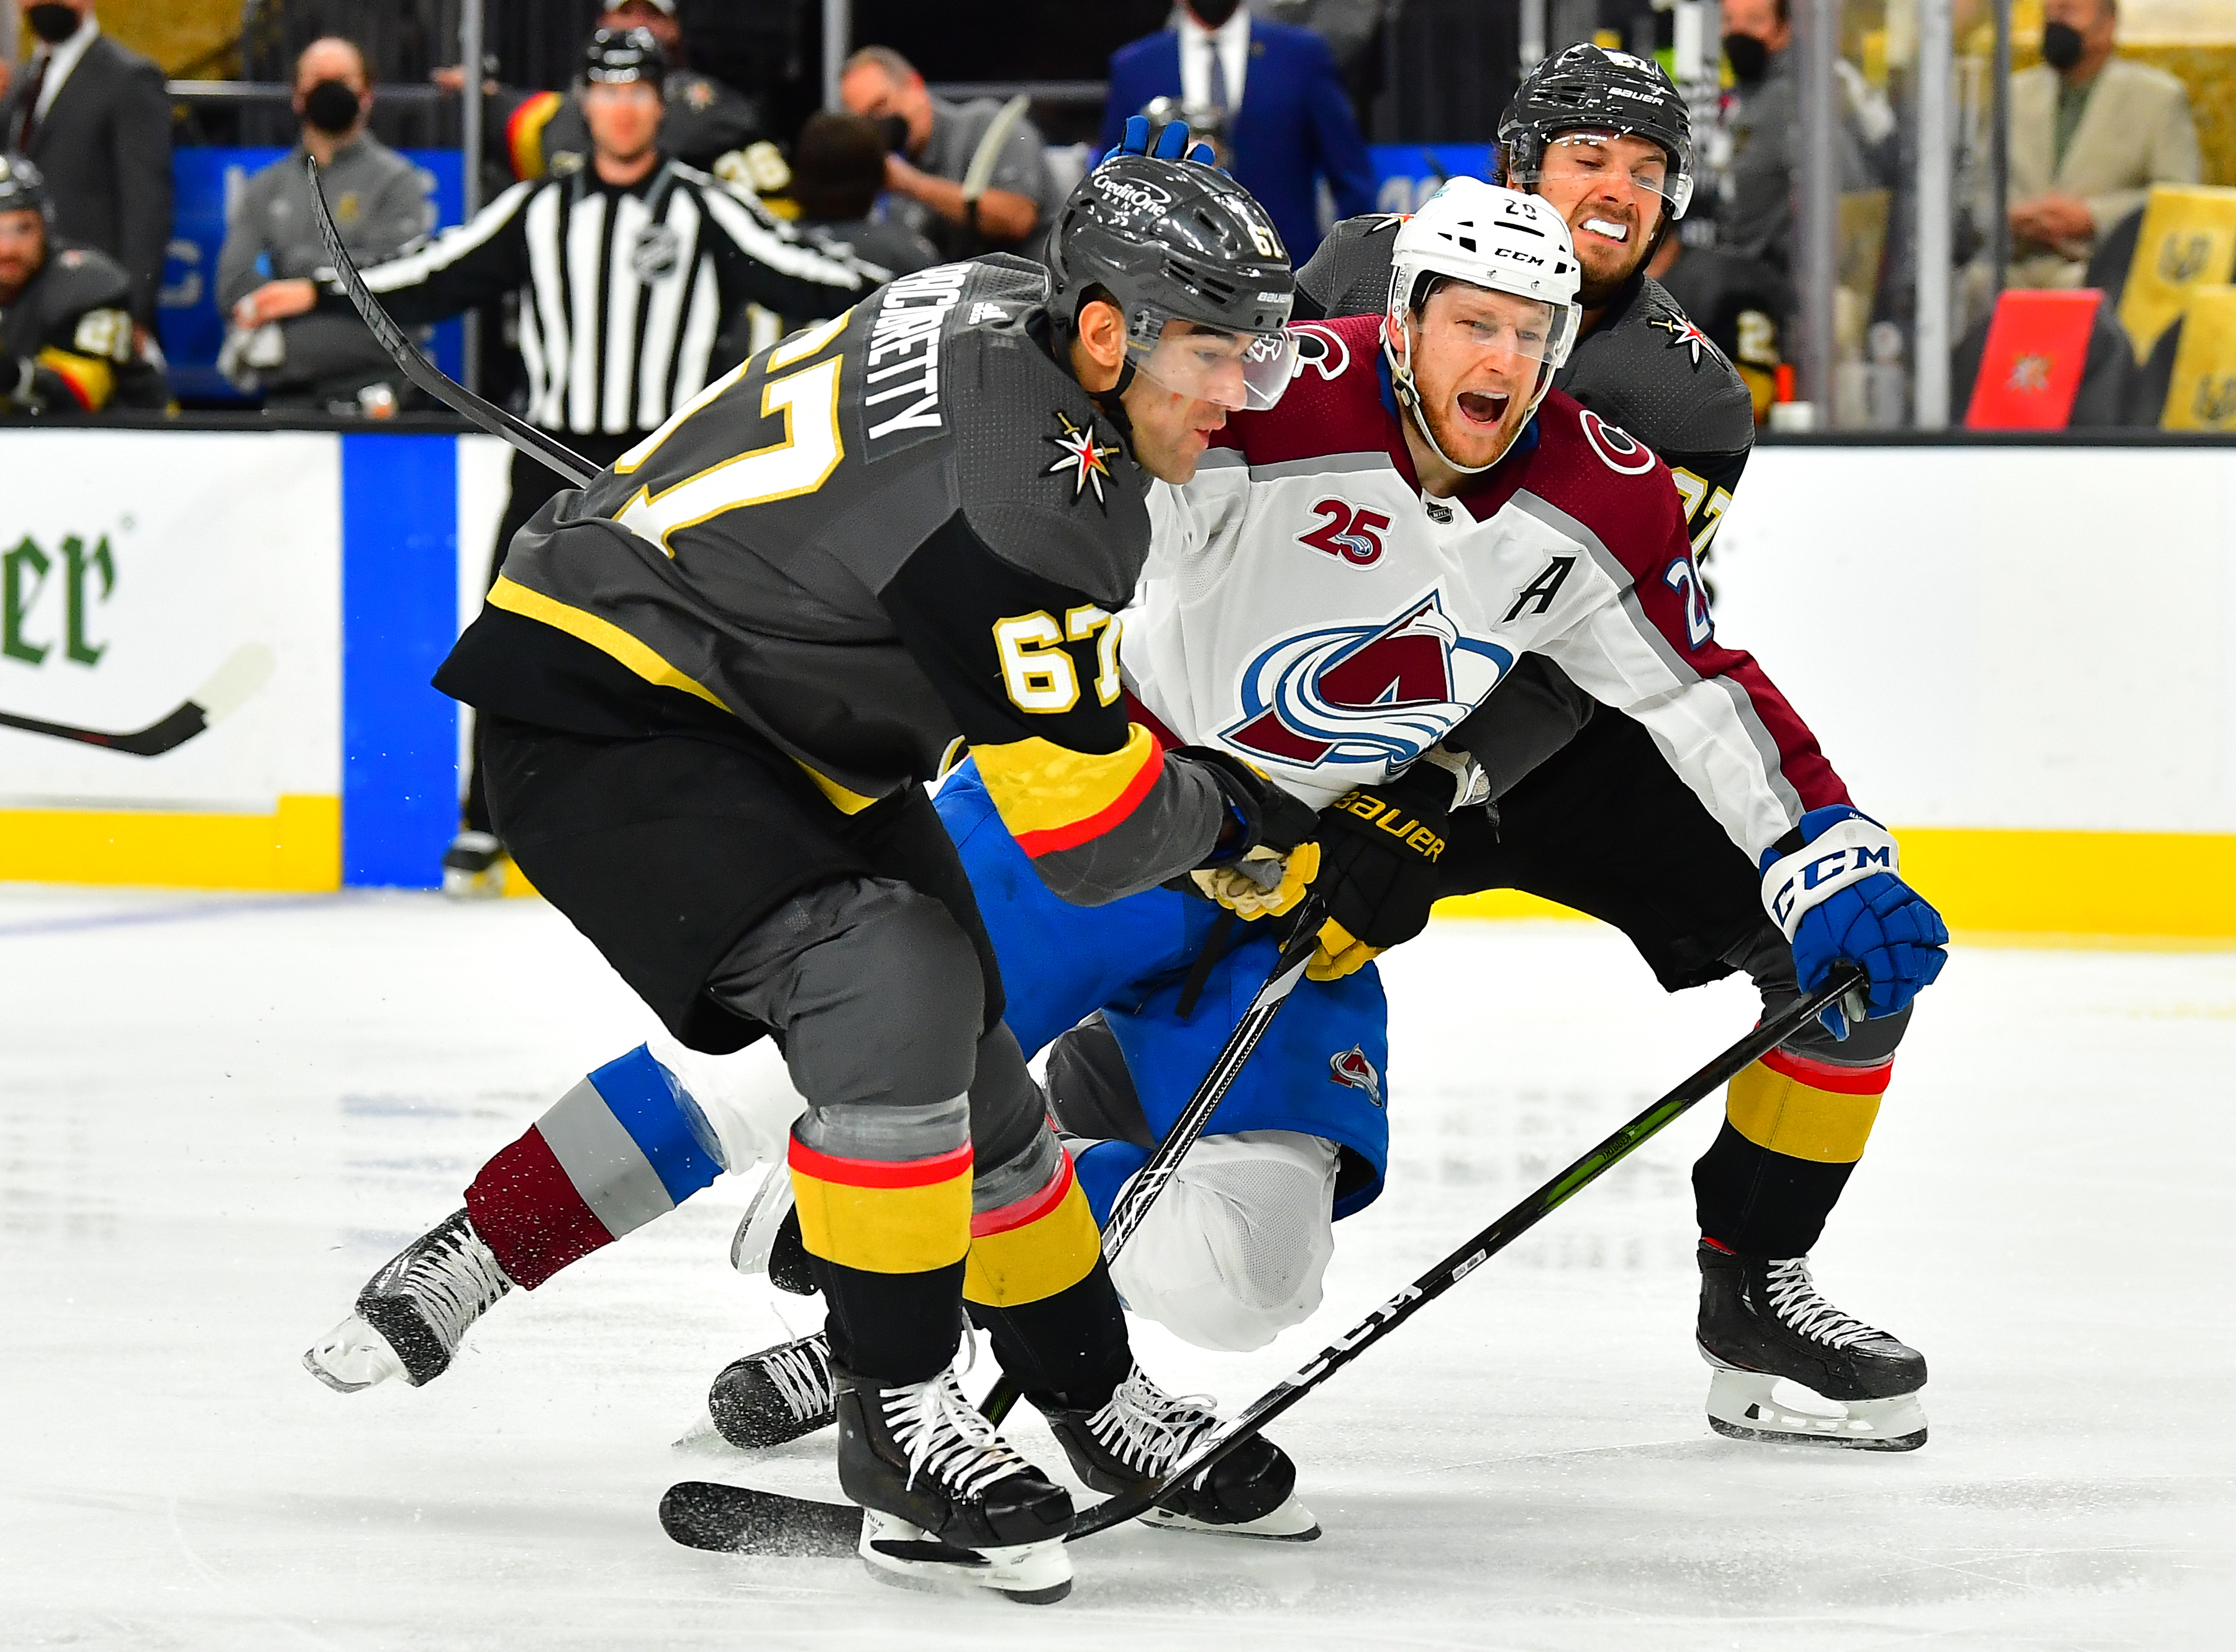 NHL: Colorado Avalanche at Vegas